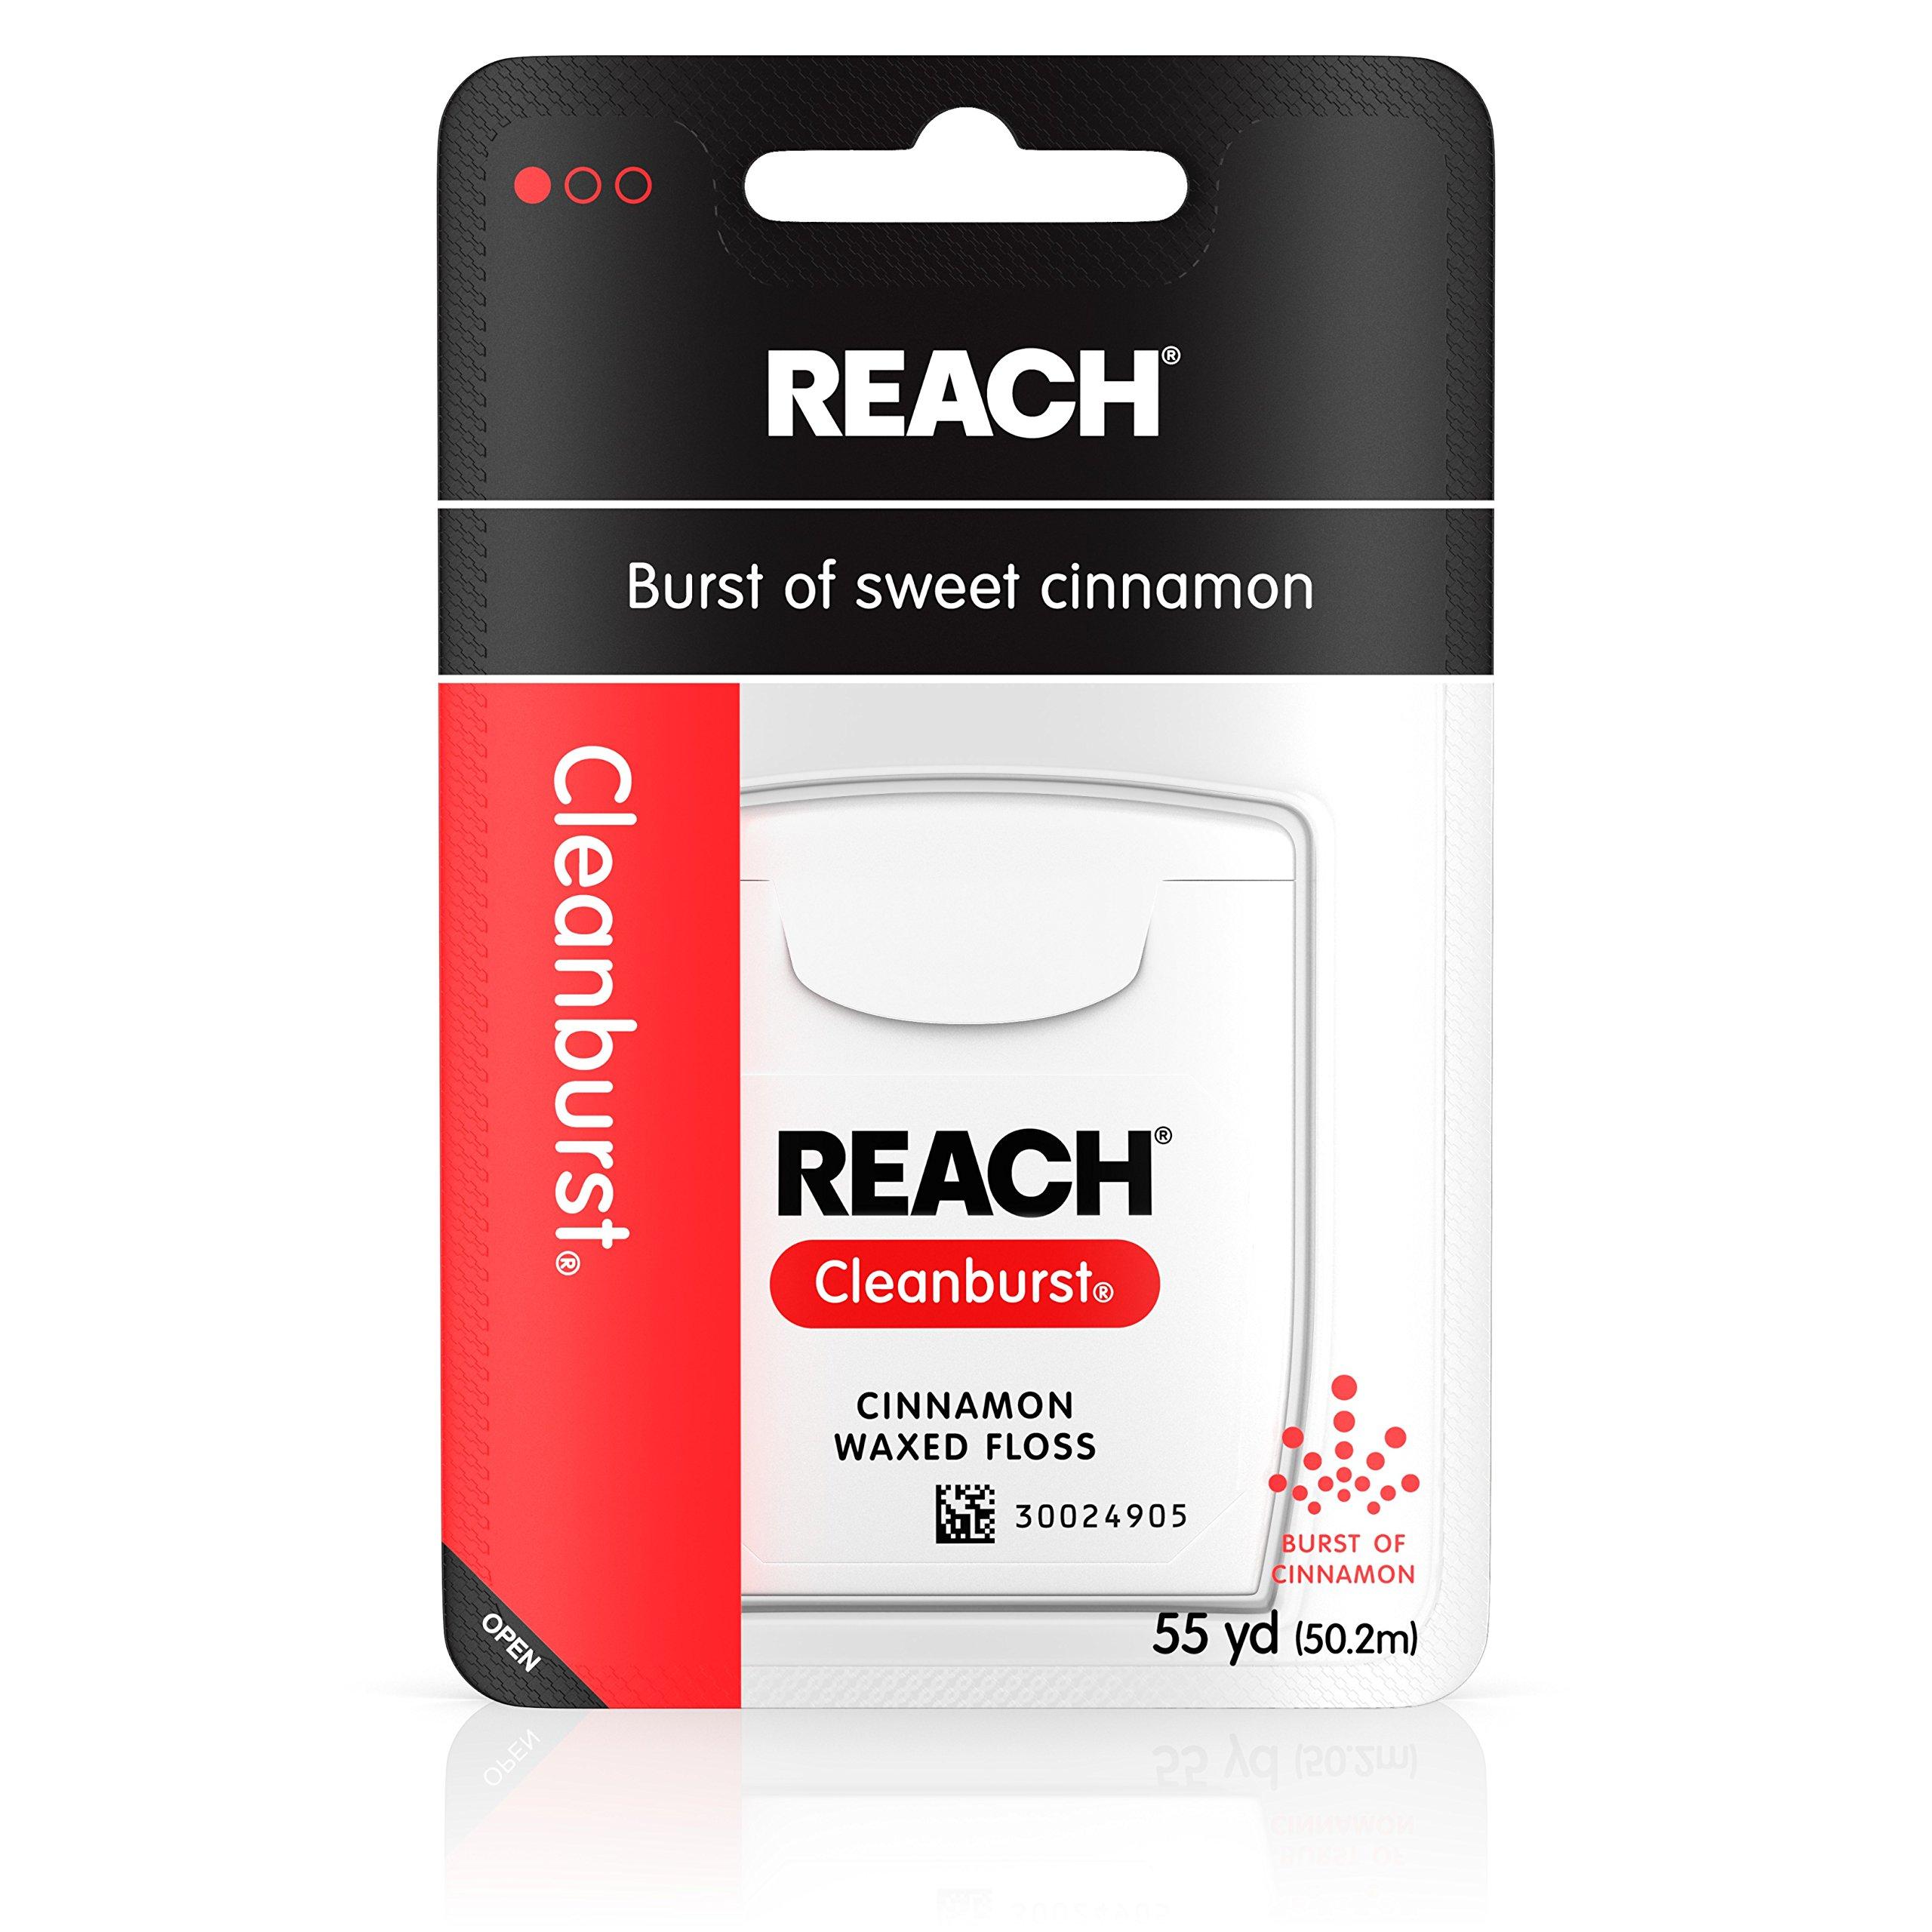 Reach Cleanburst Waxed Floss, Cinnamon, 55 Yd (pack of 6)